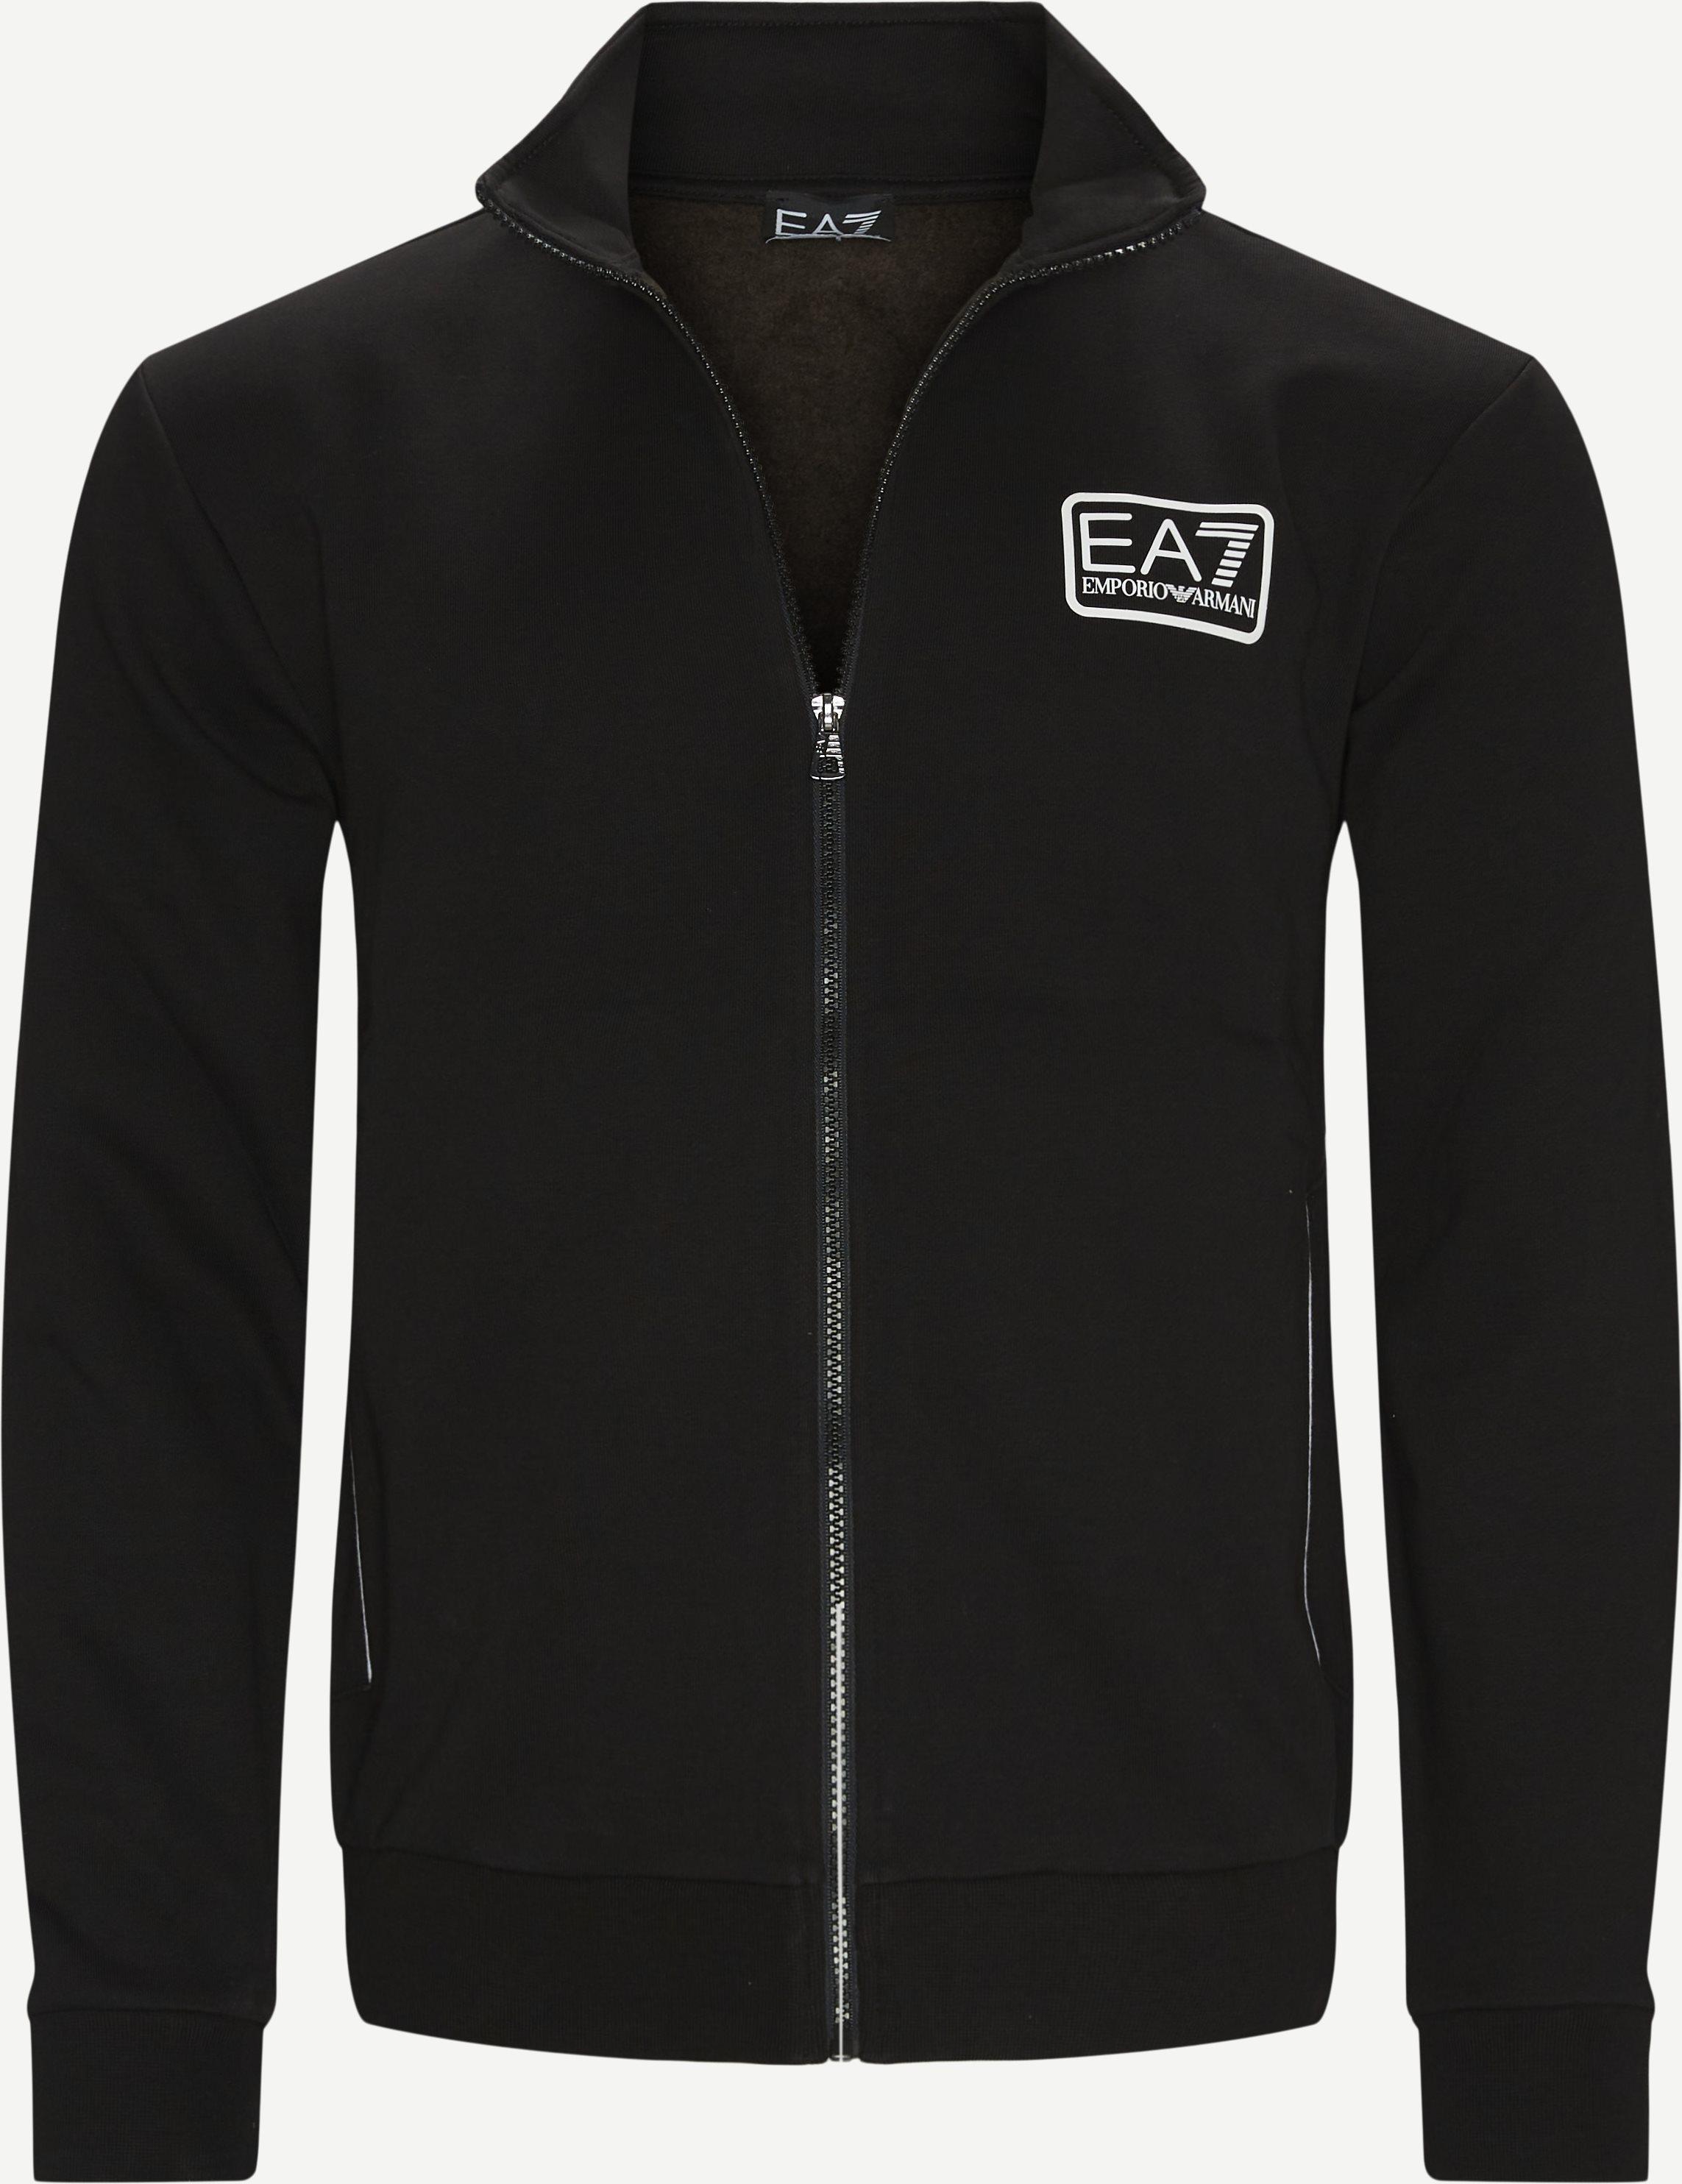 6KPV67 Sweatshirt - Sweatshirts - Regular fit - Sort